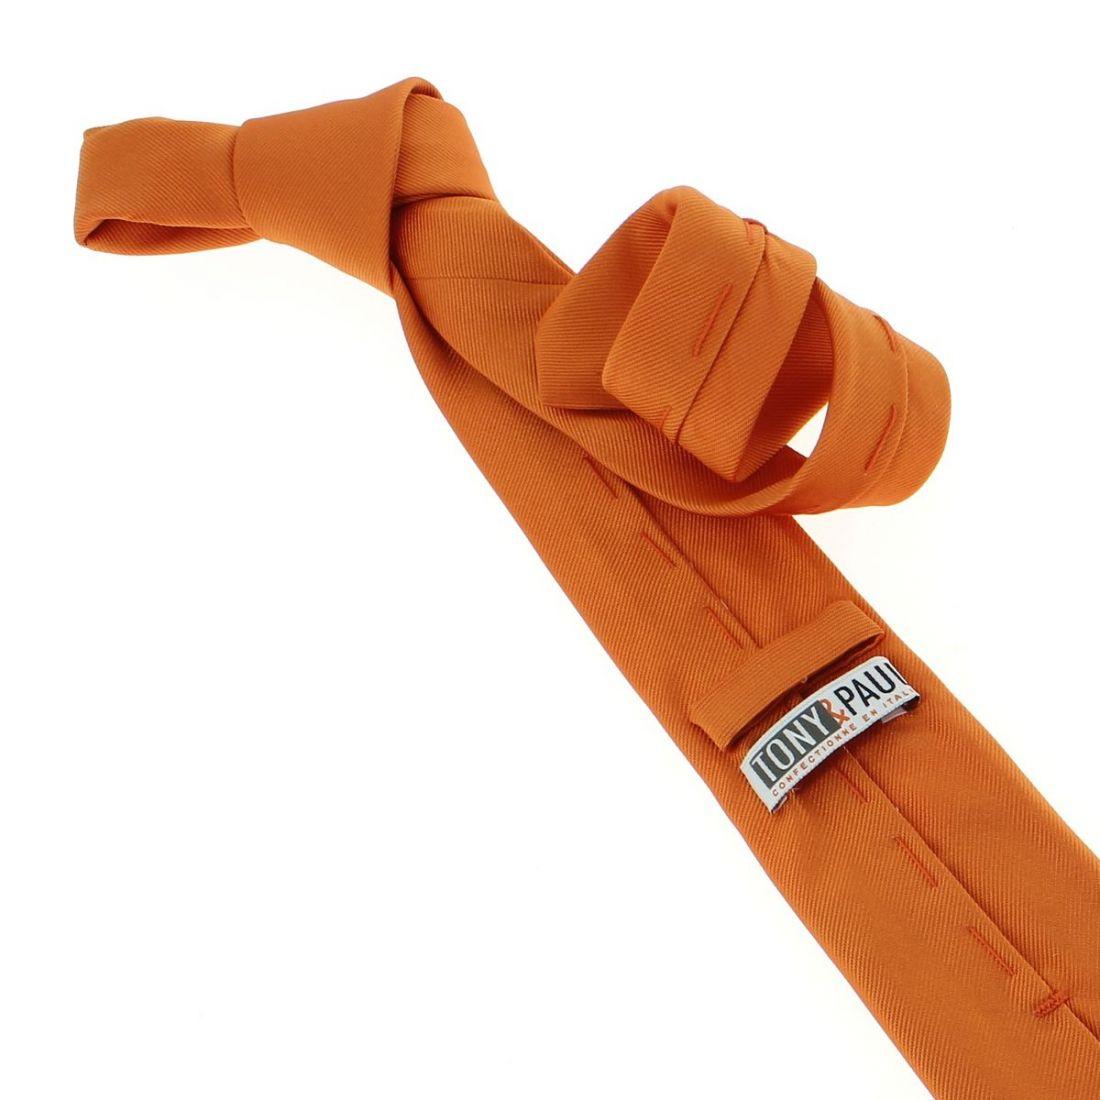 cravate luxe faite la main orange rame cravate. Black Bedroom Furniture Sets. Home Design Ideas